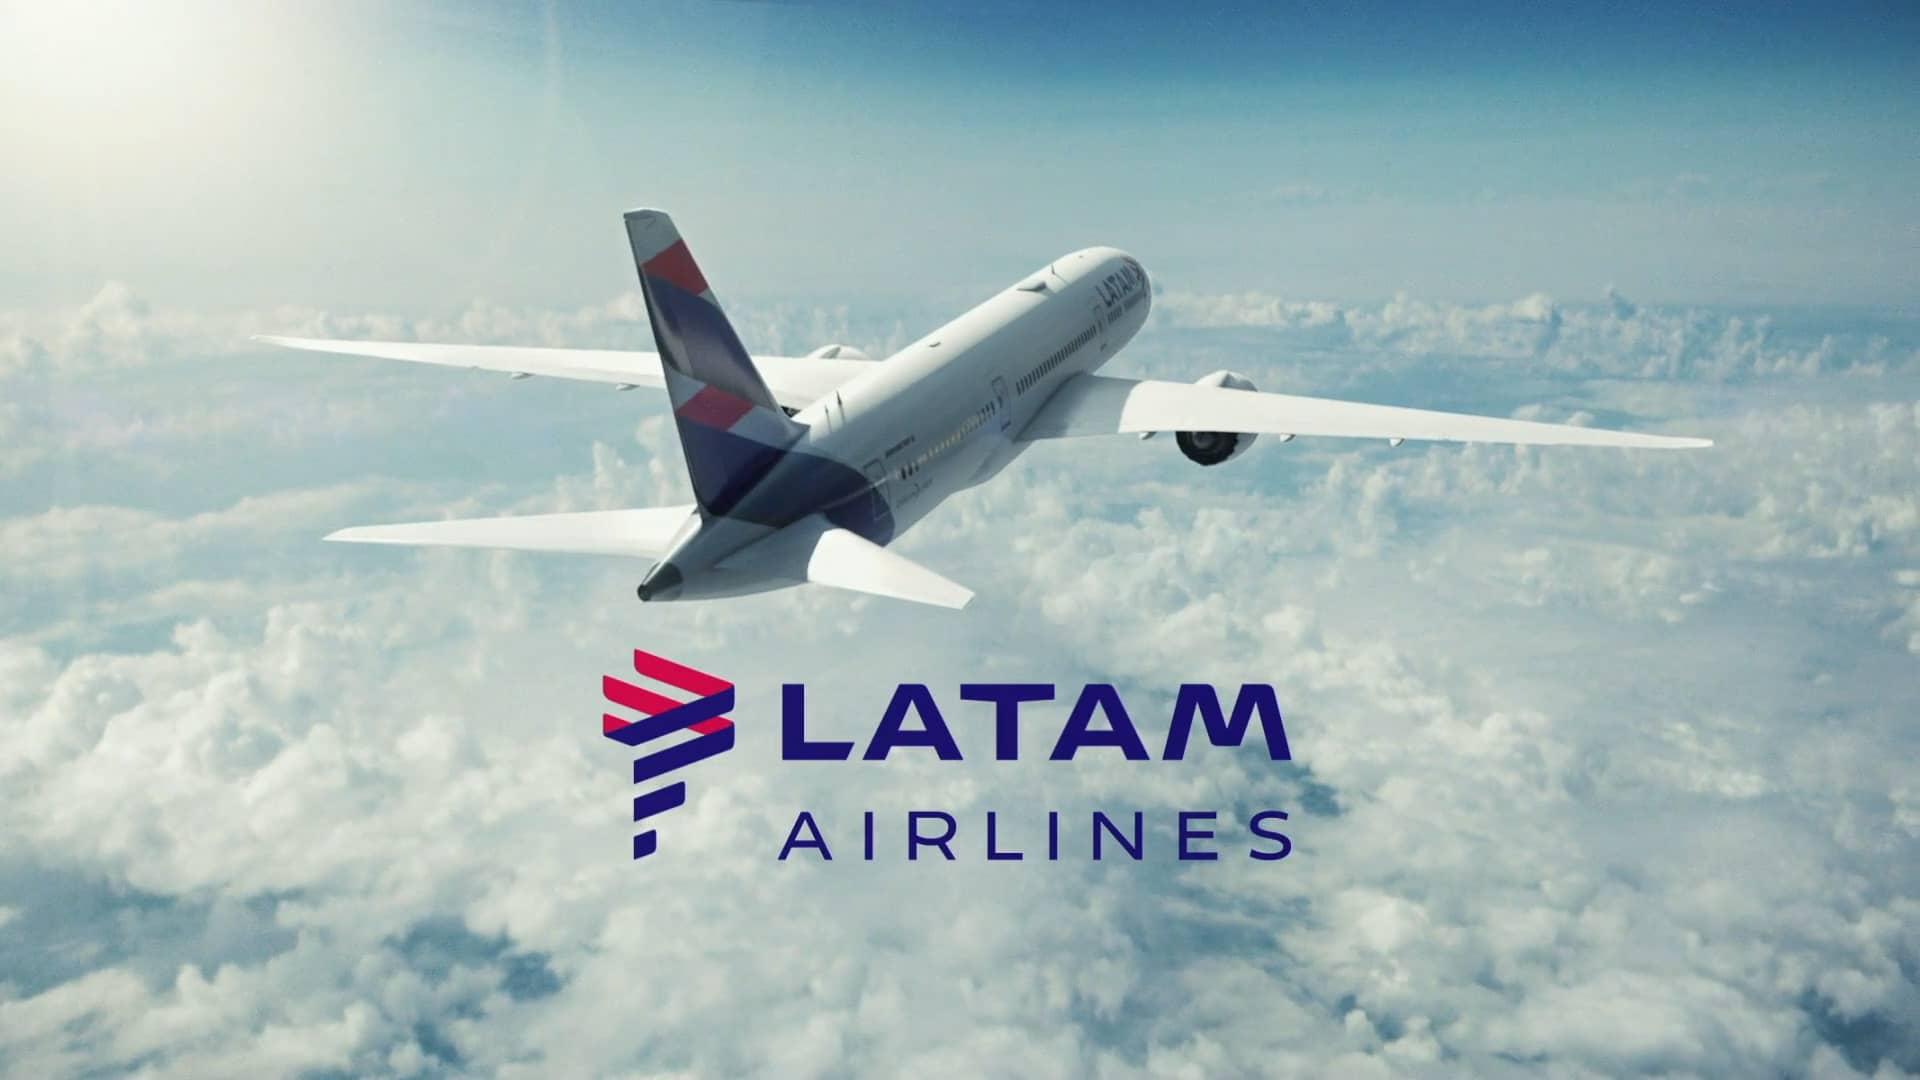 LATAM: Η μεγαλύτερη αεροπορική εταιρεία της Λατινικής Αμερικής ...